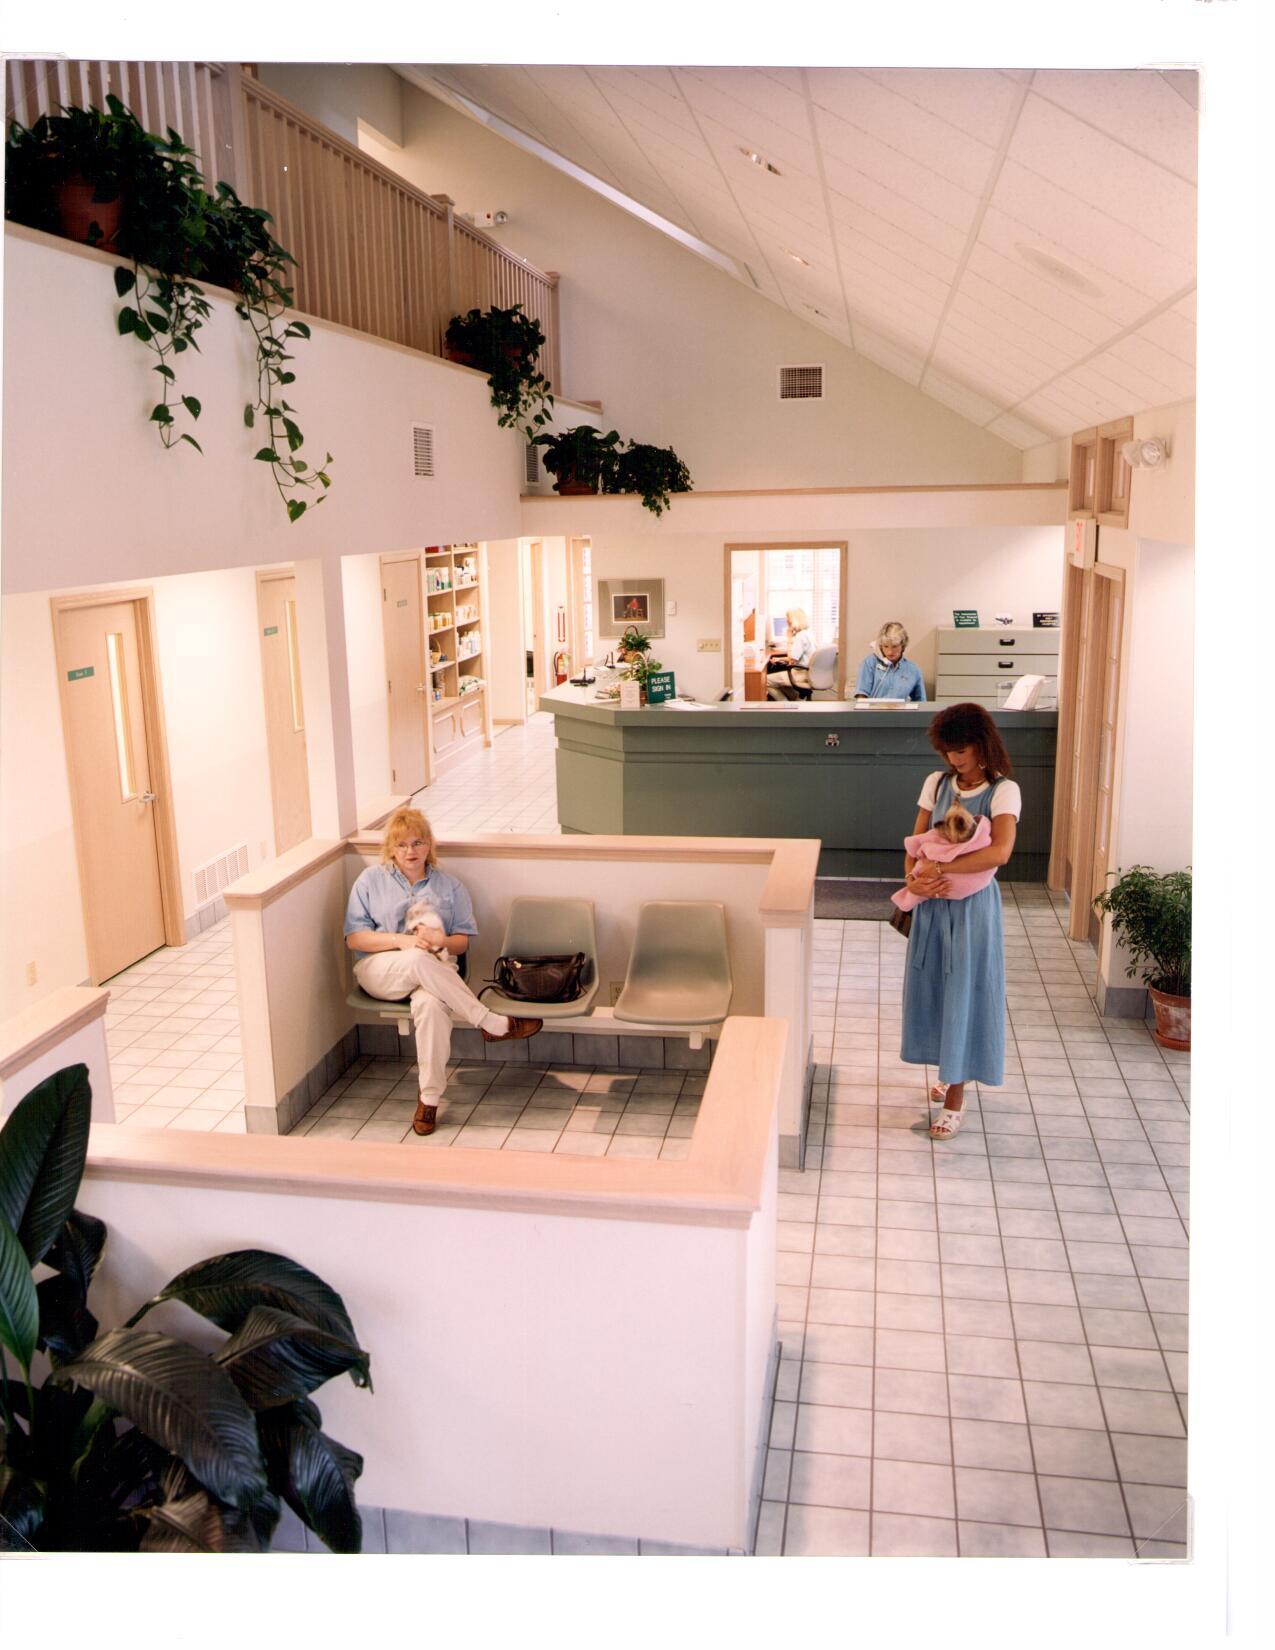 VCA Findlay Animal Hospital image 3